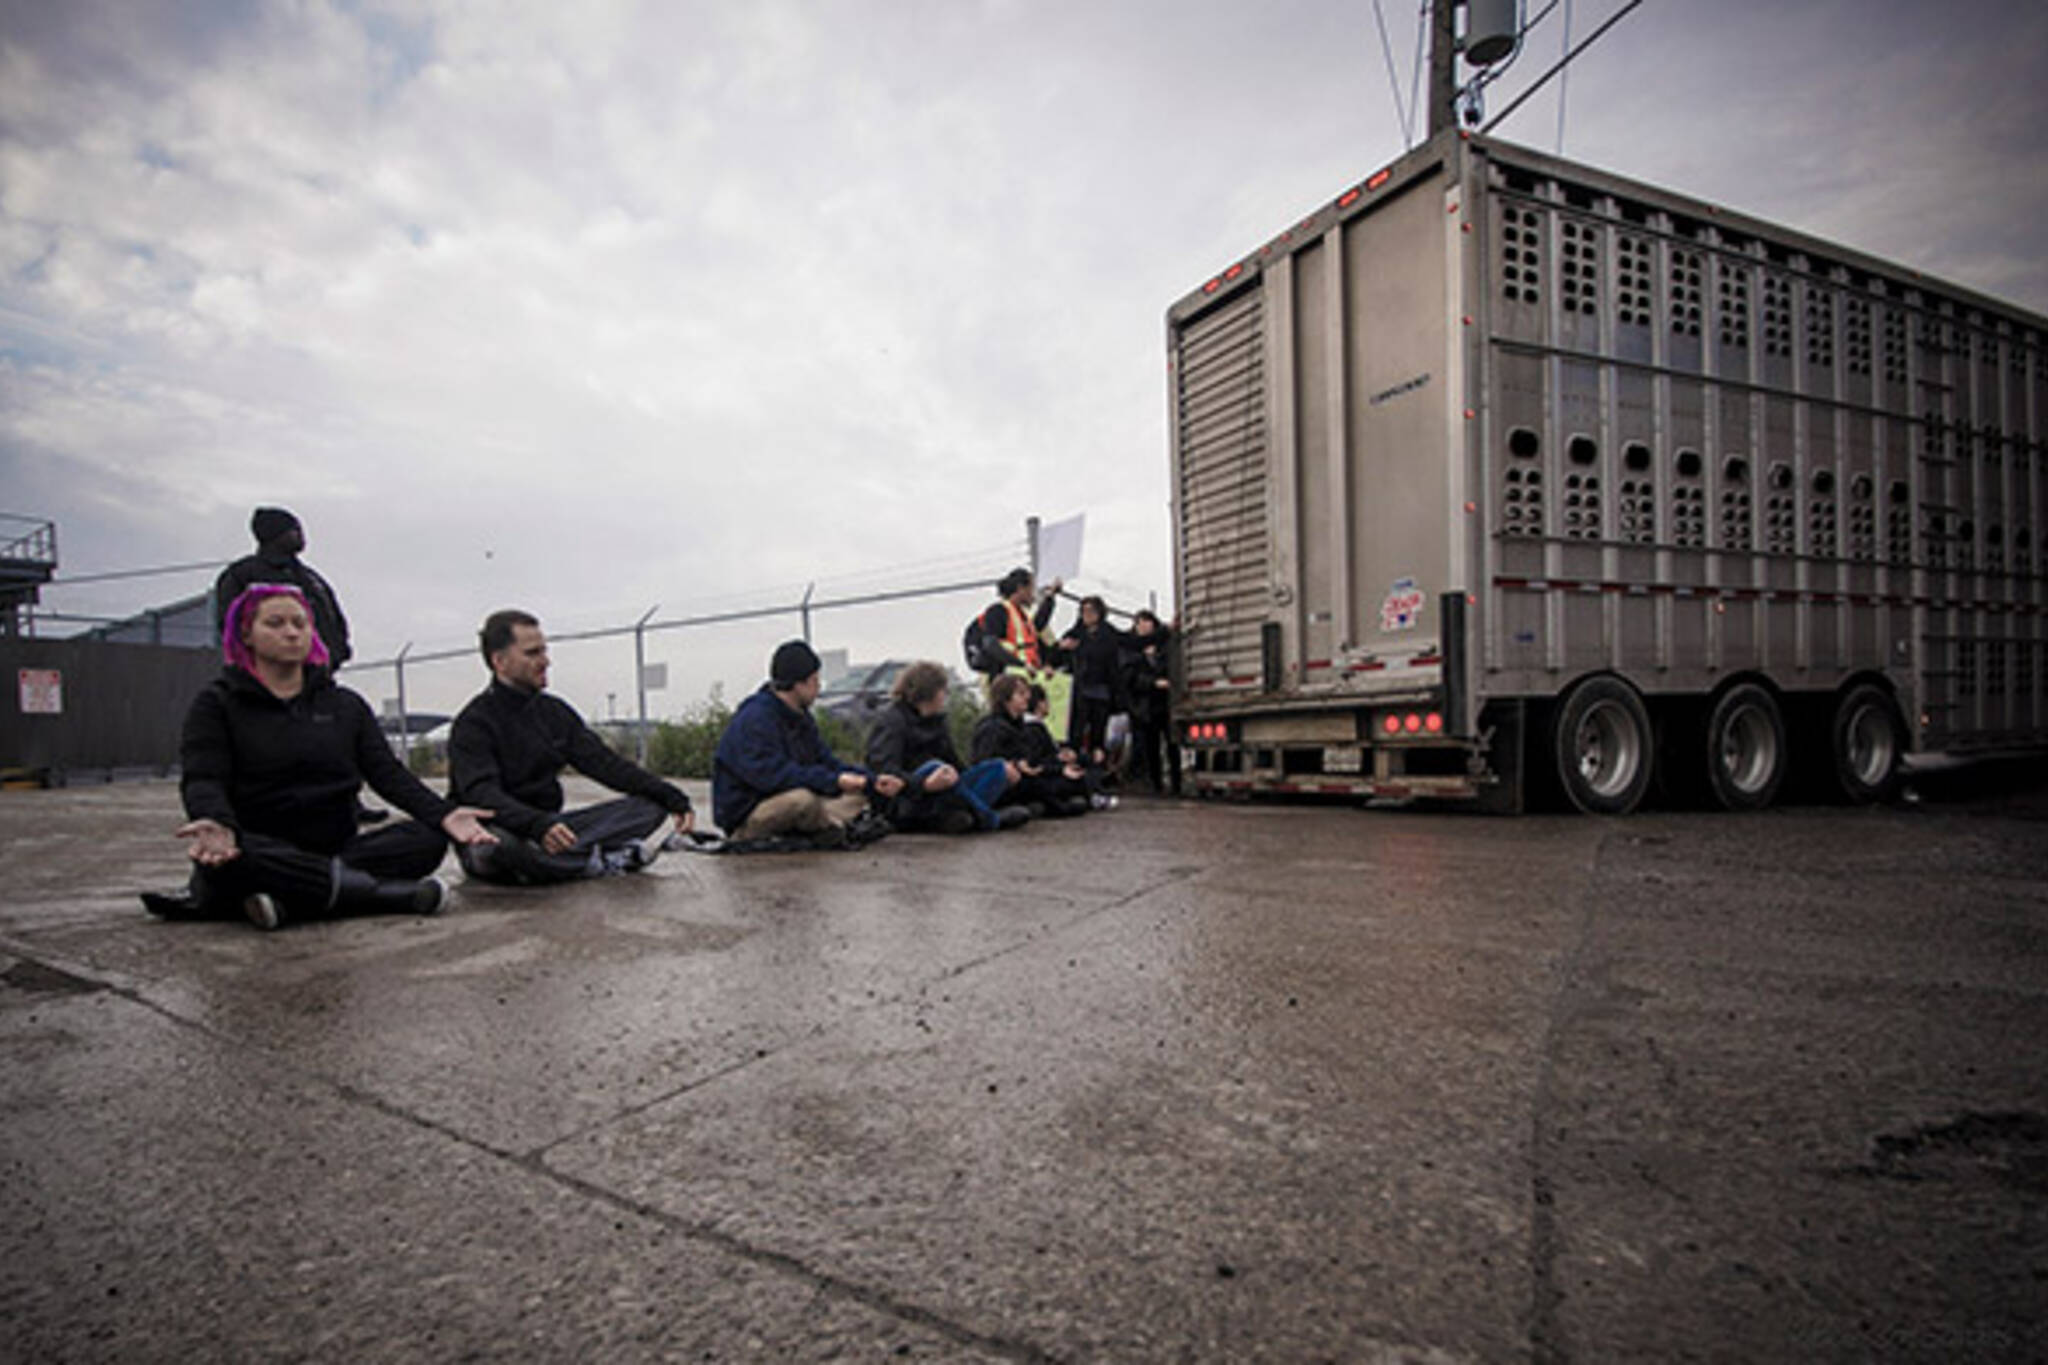 toronto slaughterhouse protest